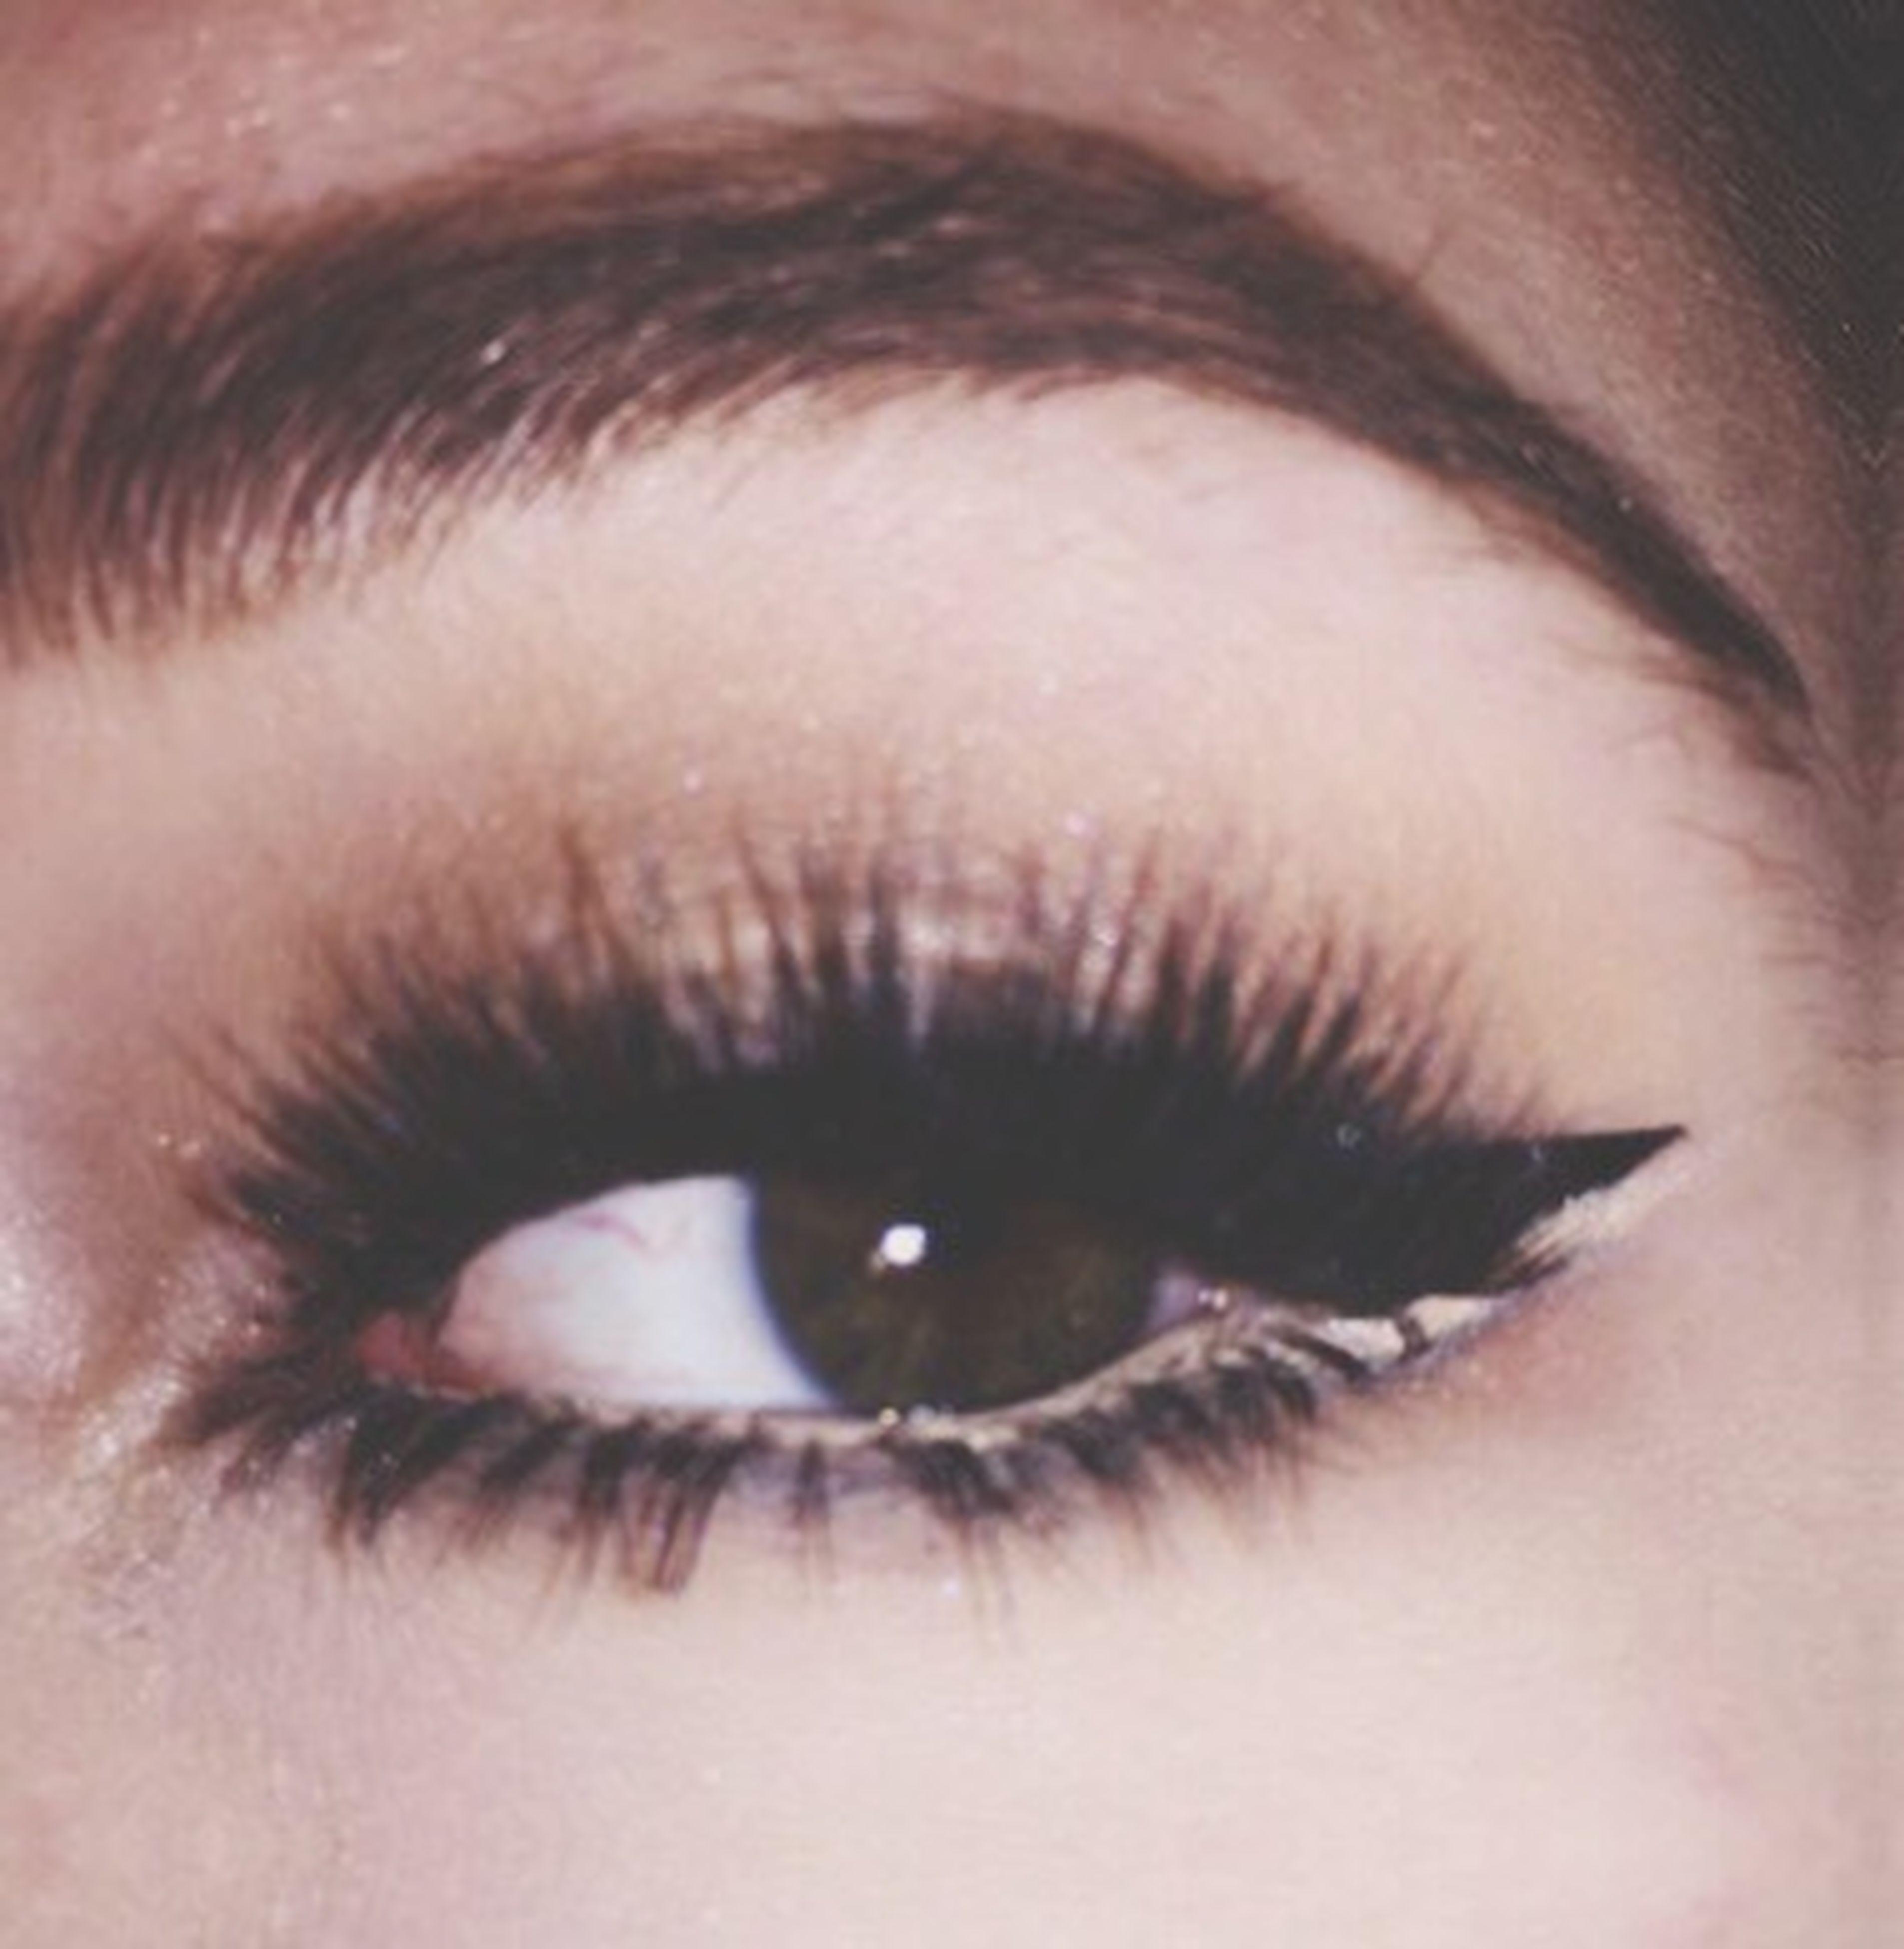 human eye, eyelash, looking at camera, eyesight, close-up, part of, portrait, staring, sensory perception, eyebrow, extreme close-up, human face, focus on foreground, eyeball, macro, person, full frame, human skin, make-up, extreme close up, iris - eye, young adult, one woman only, beauty, vision